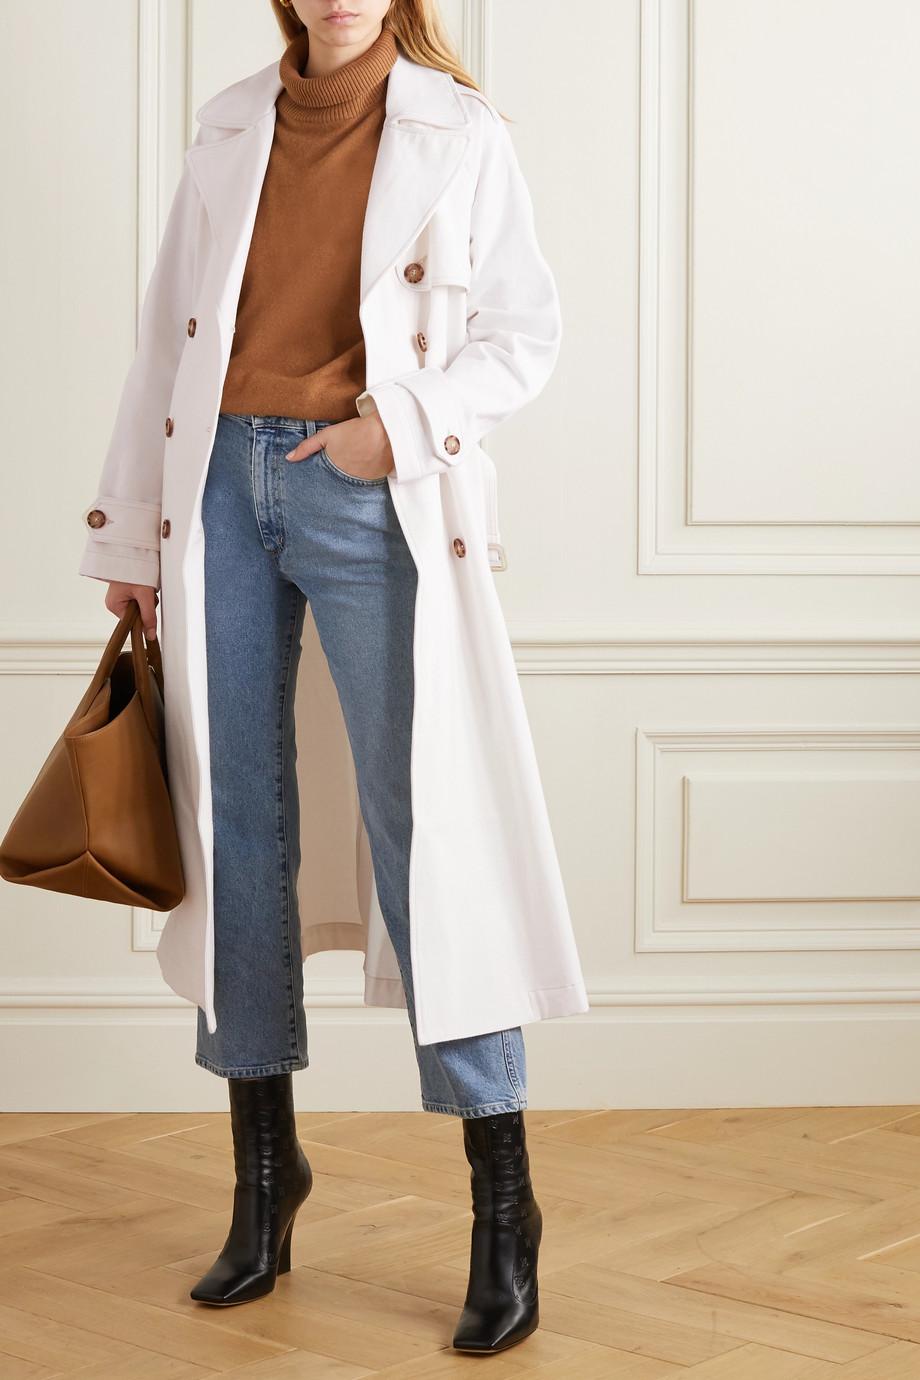 GOLDSIGN + NET SUSTAIN The Classic organic denim trench coat